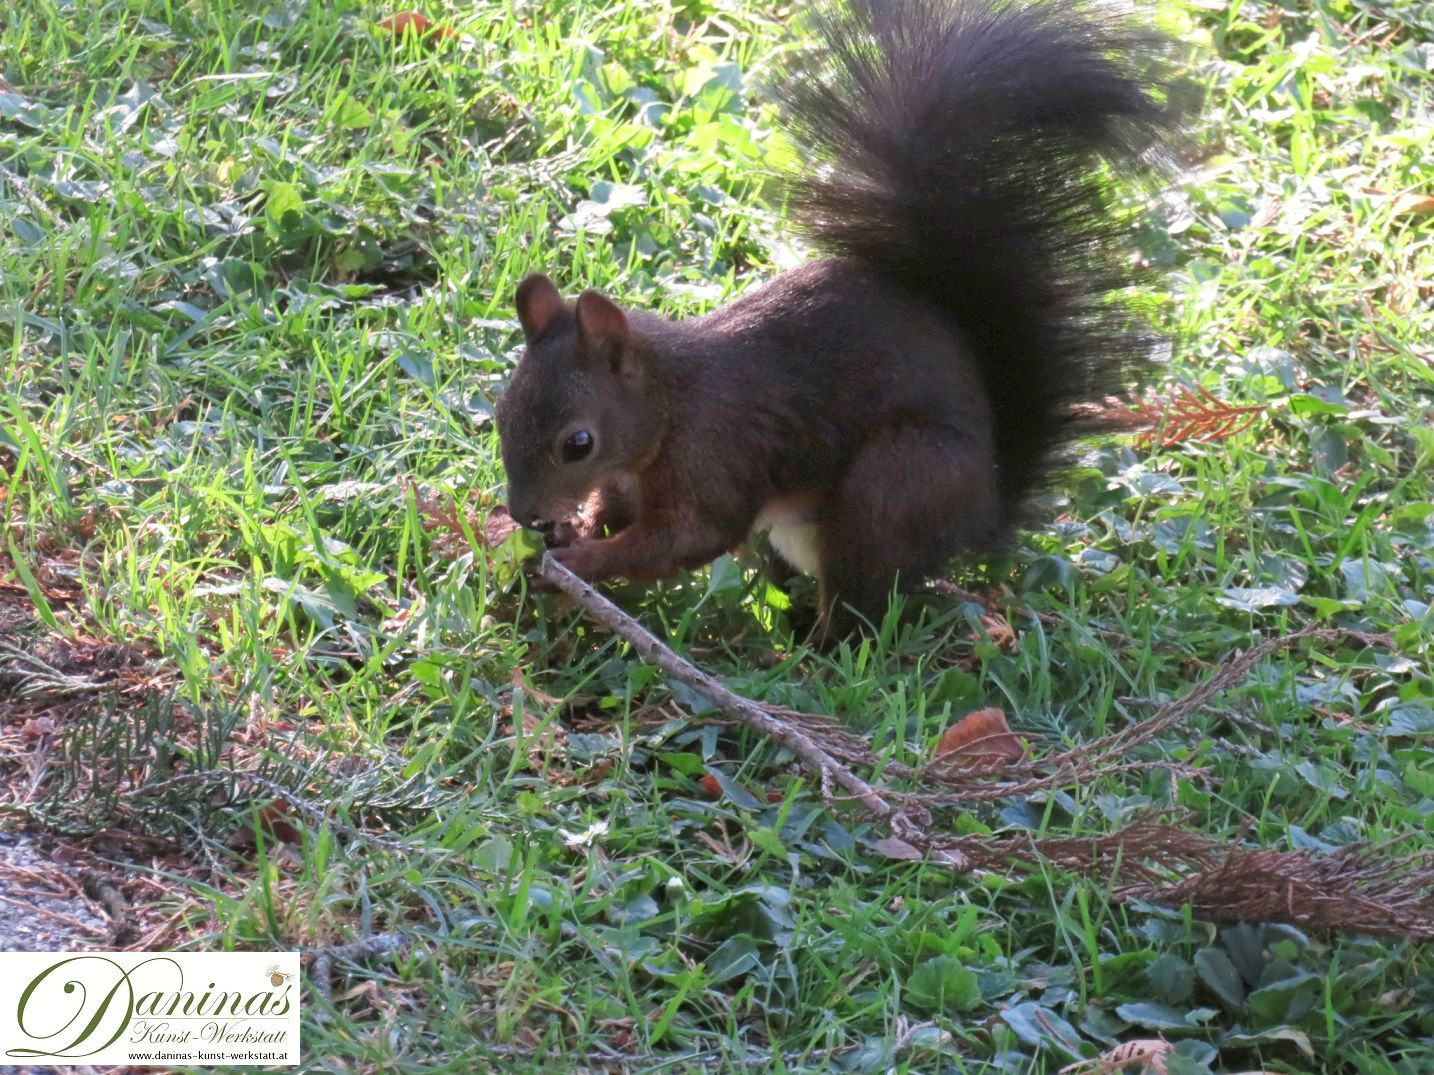 Eichhörnchen knappert kleinen Rasenpilz